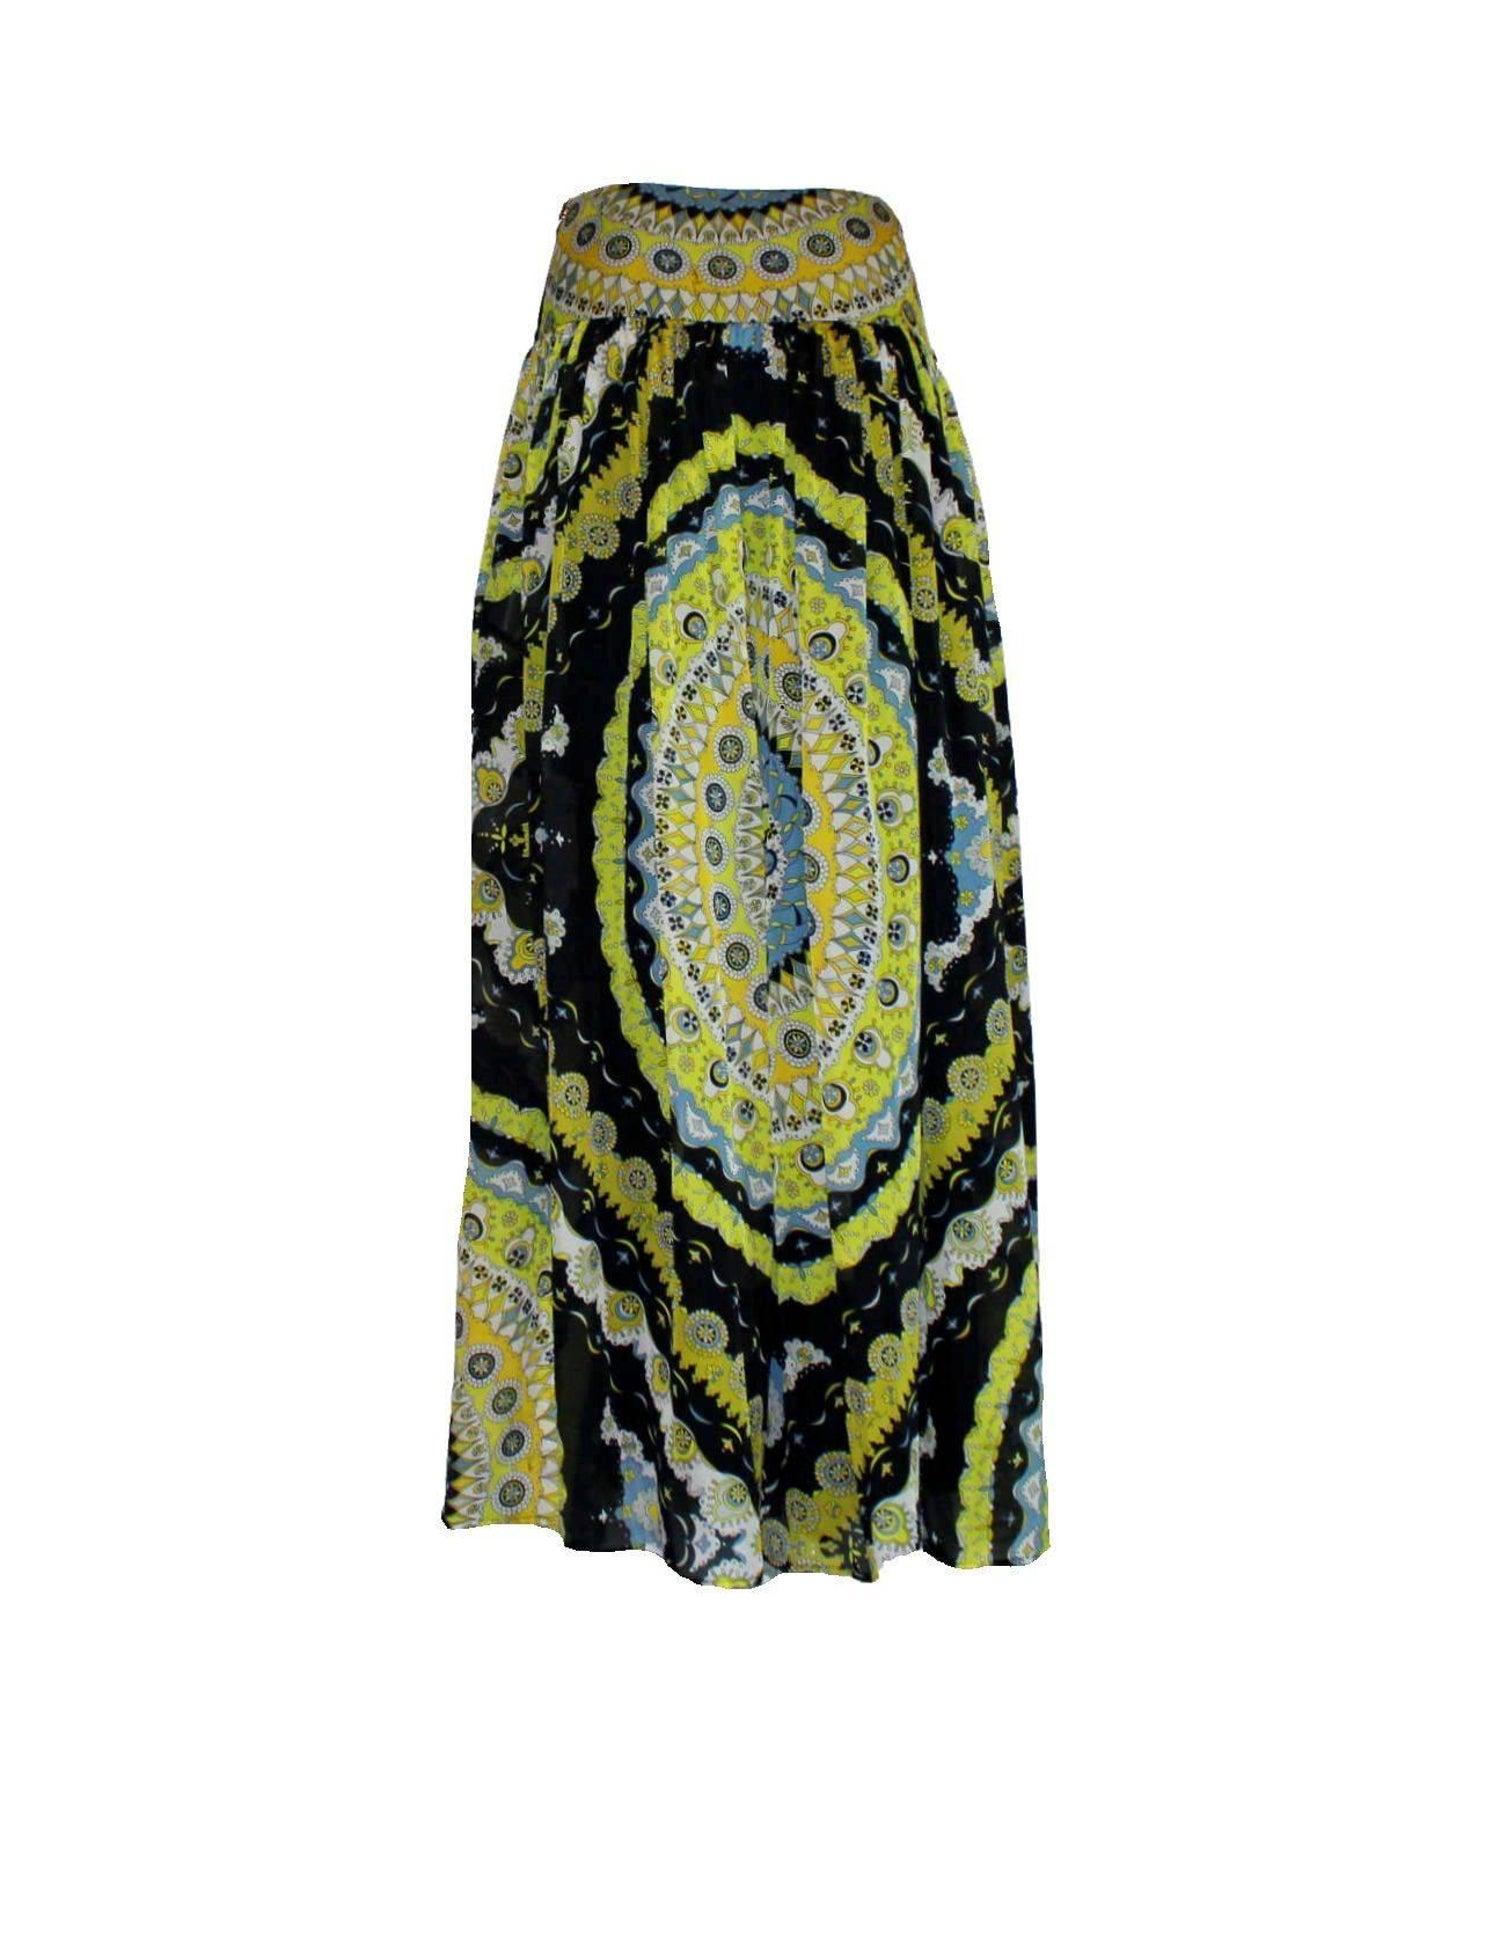 965f57190445 Emilio Pucci Signature Print Silk Maxi Gypsy Skirt For Sale at 1stdibs